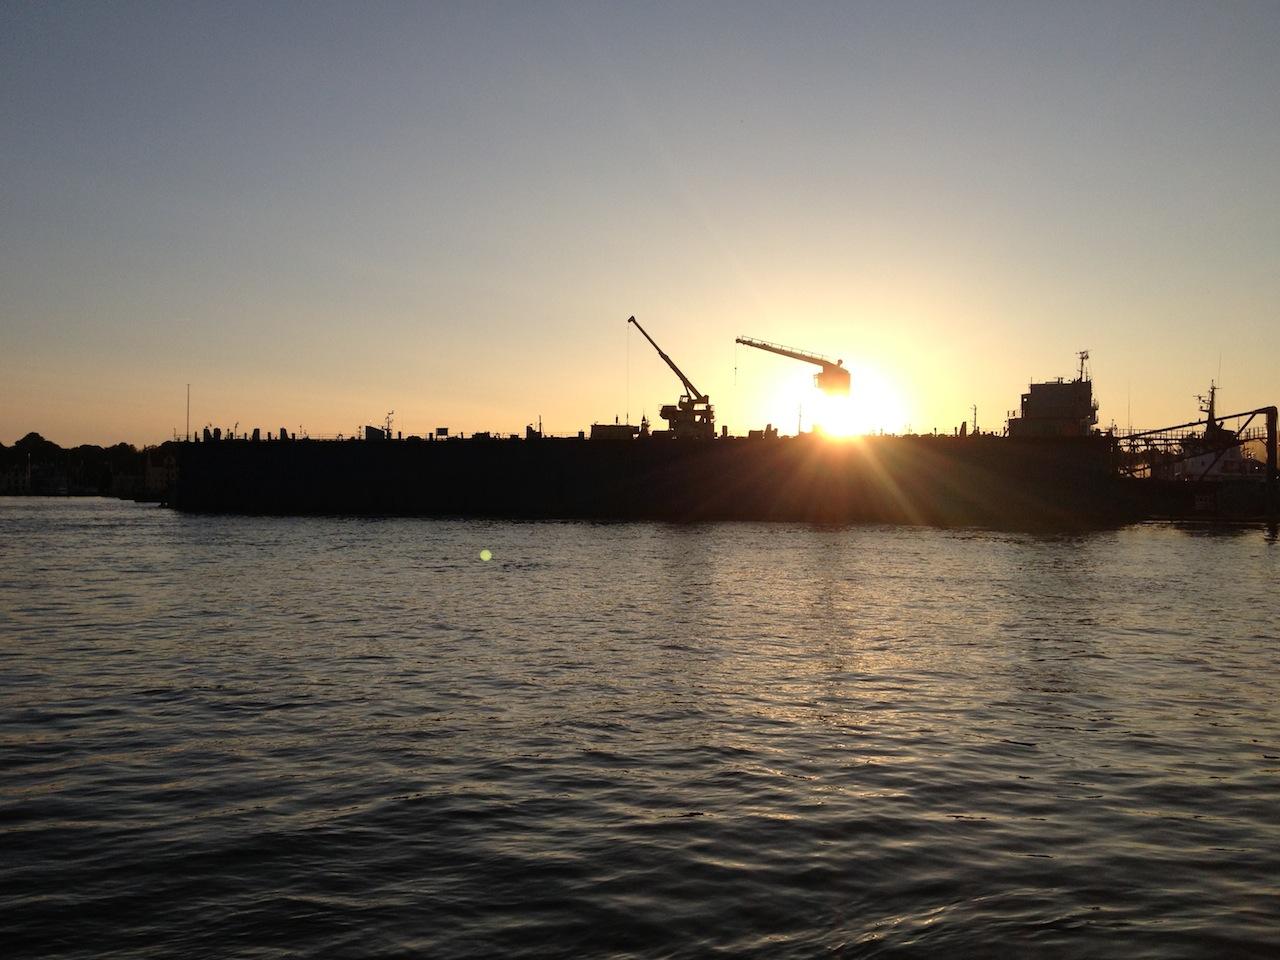 Svendborg Hafen